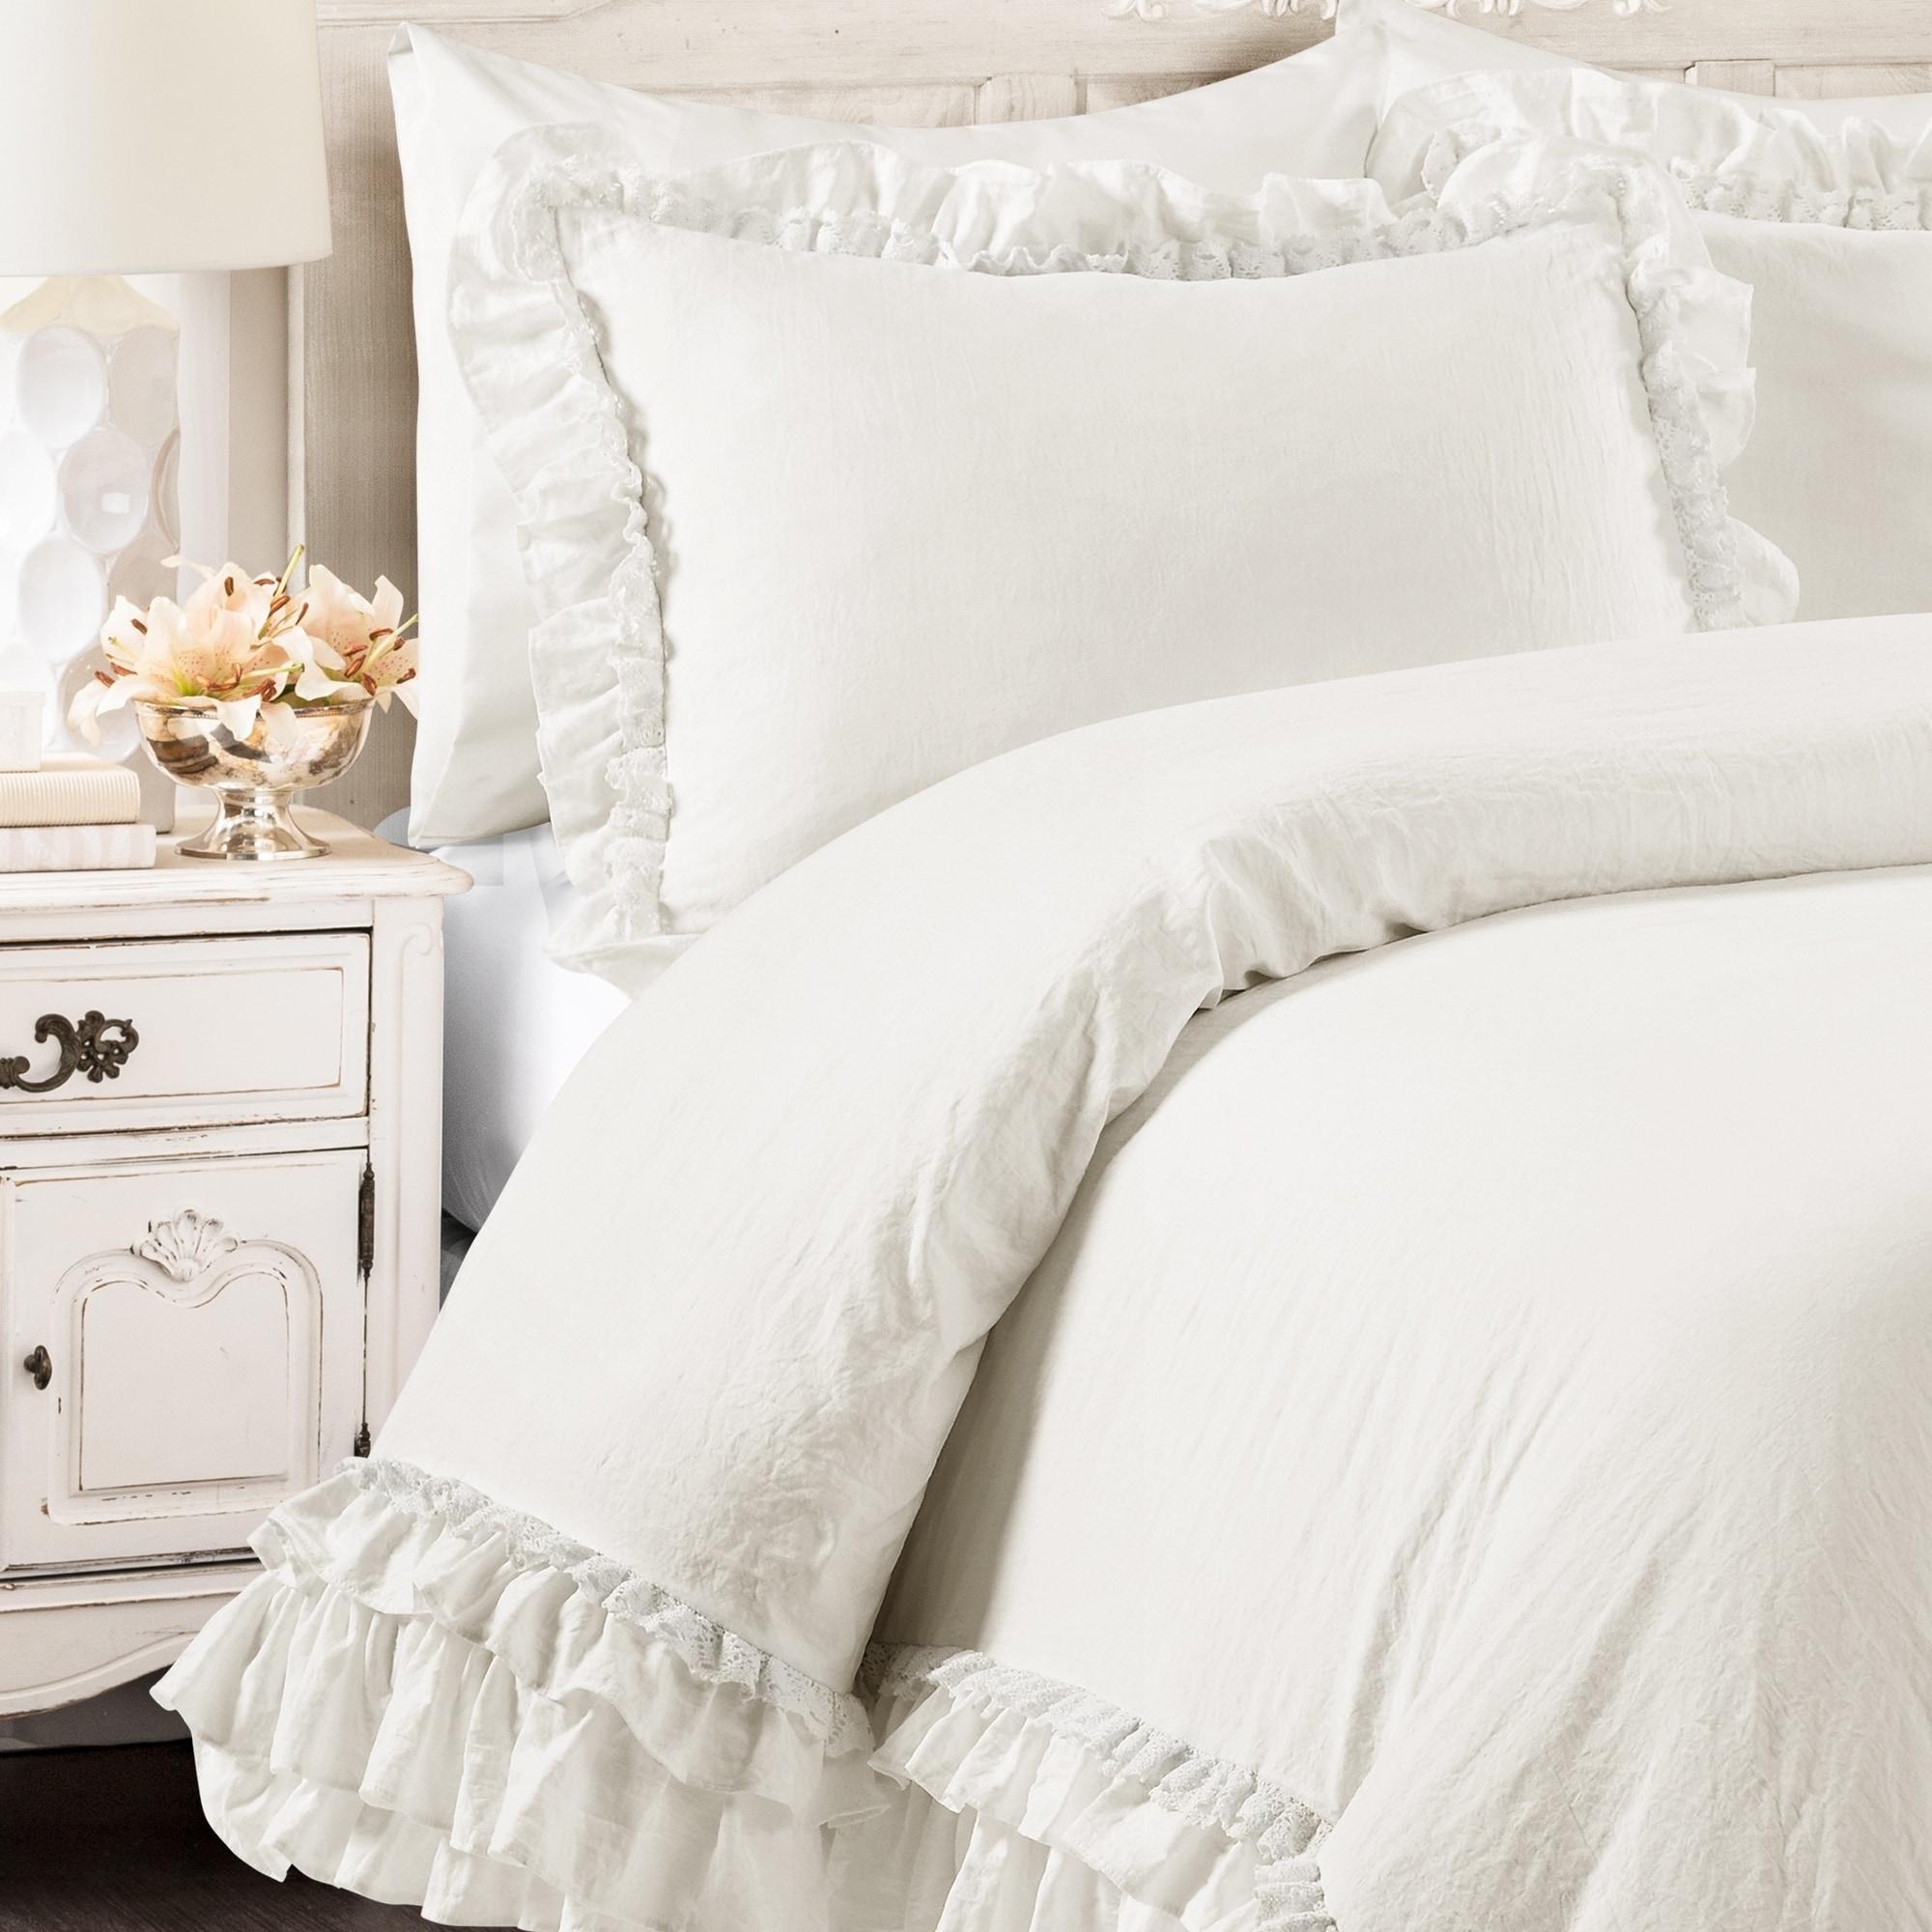 Astounding Lush Decor Ella Shabby Chic Ruffle Lace Comforter Set Interior Design Ideas Gentotthenellocom